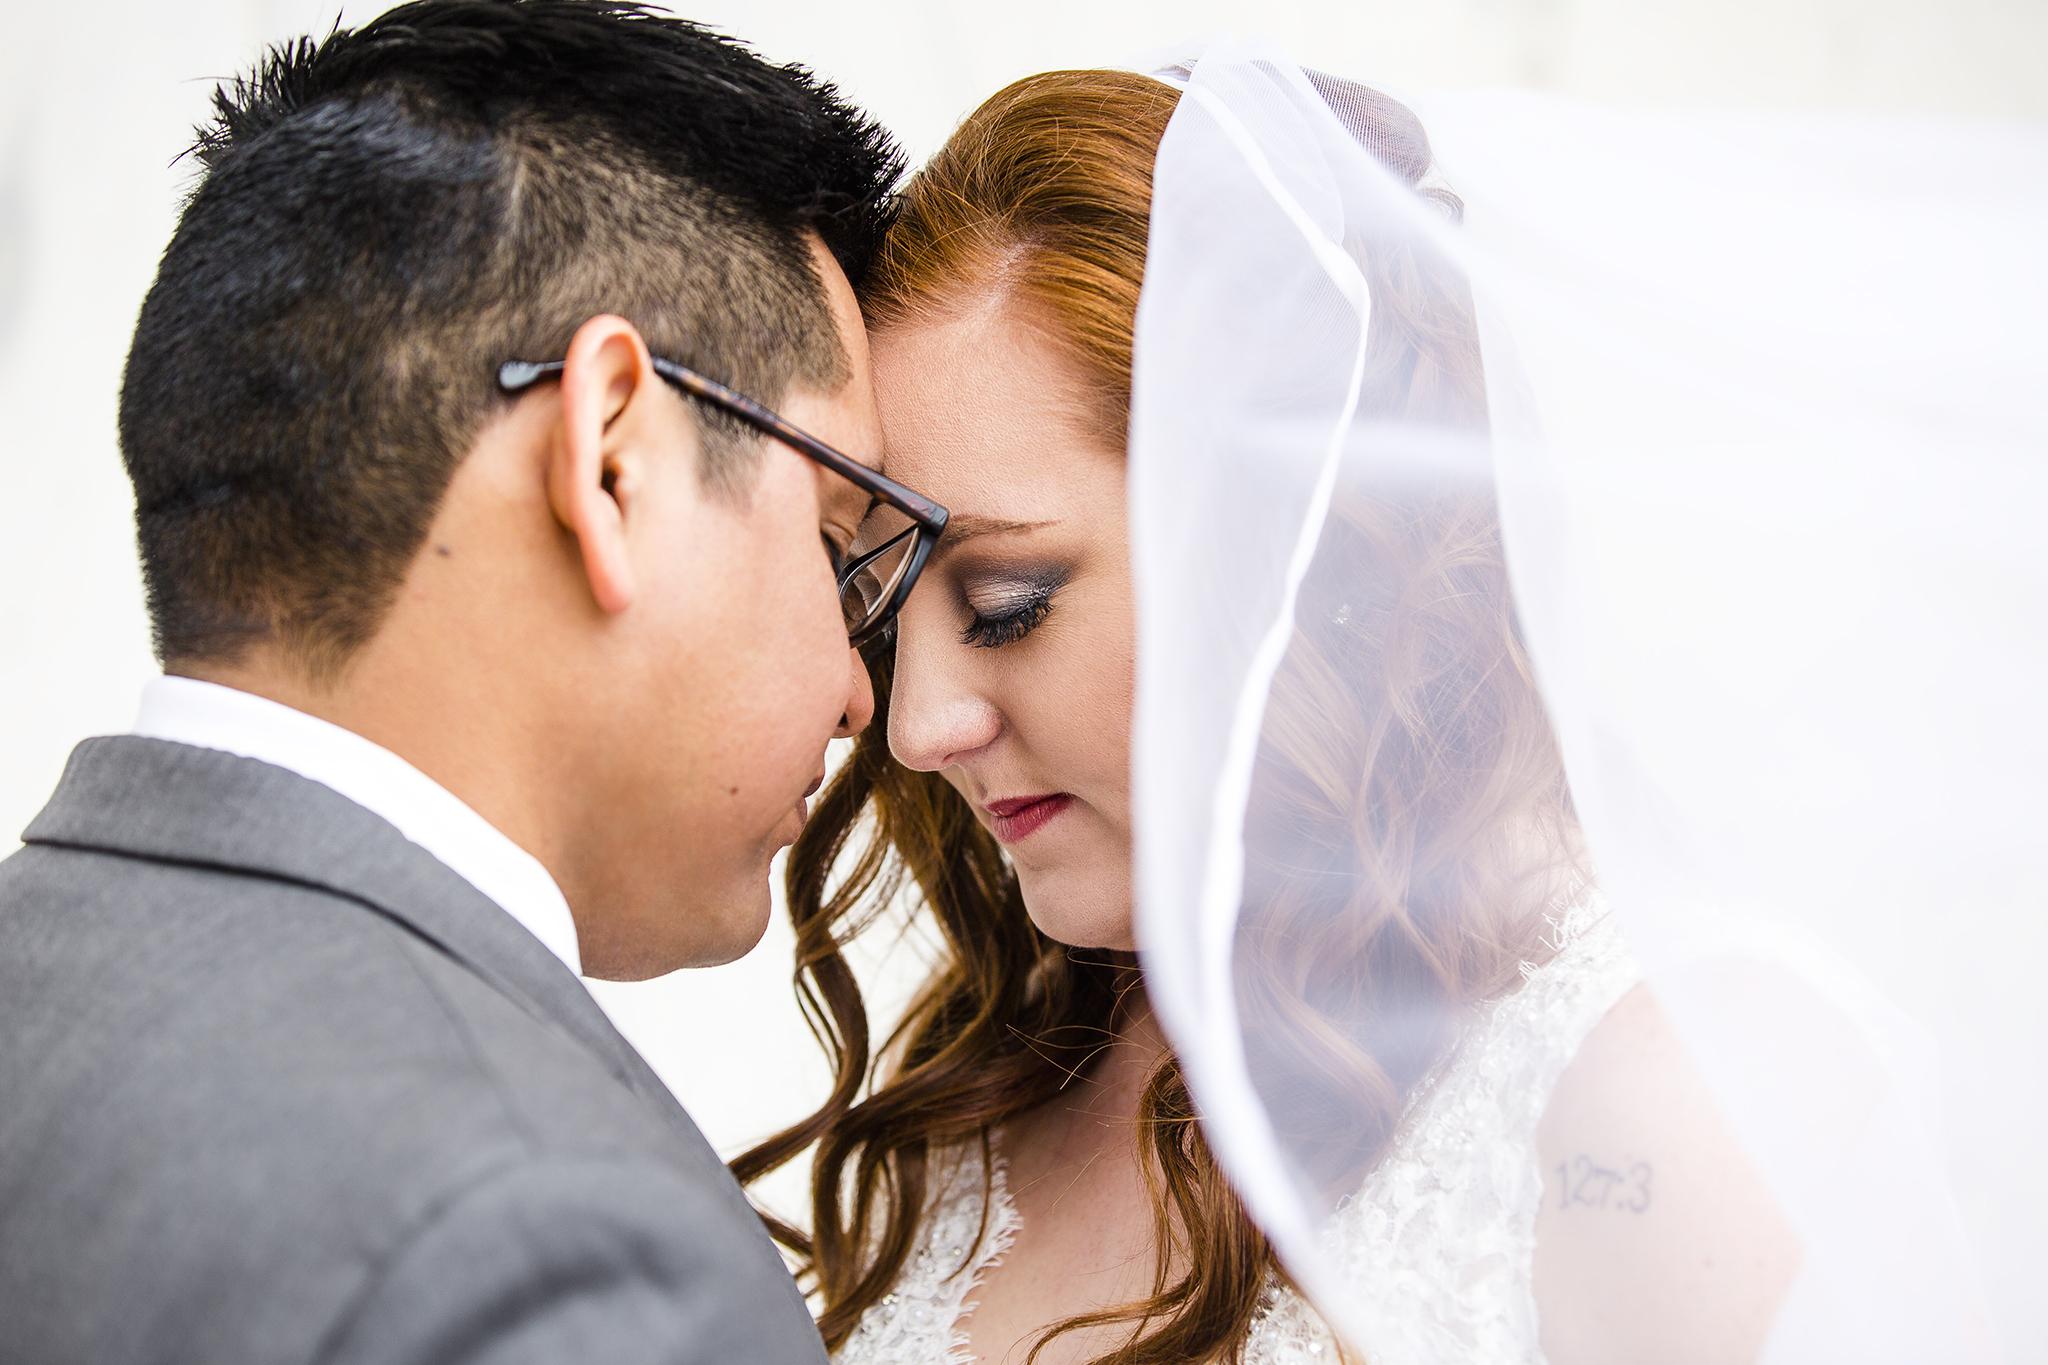 bride and groom, wedding portraits, romantic, sweet, beautiful natural light